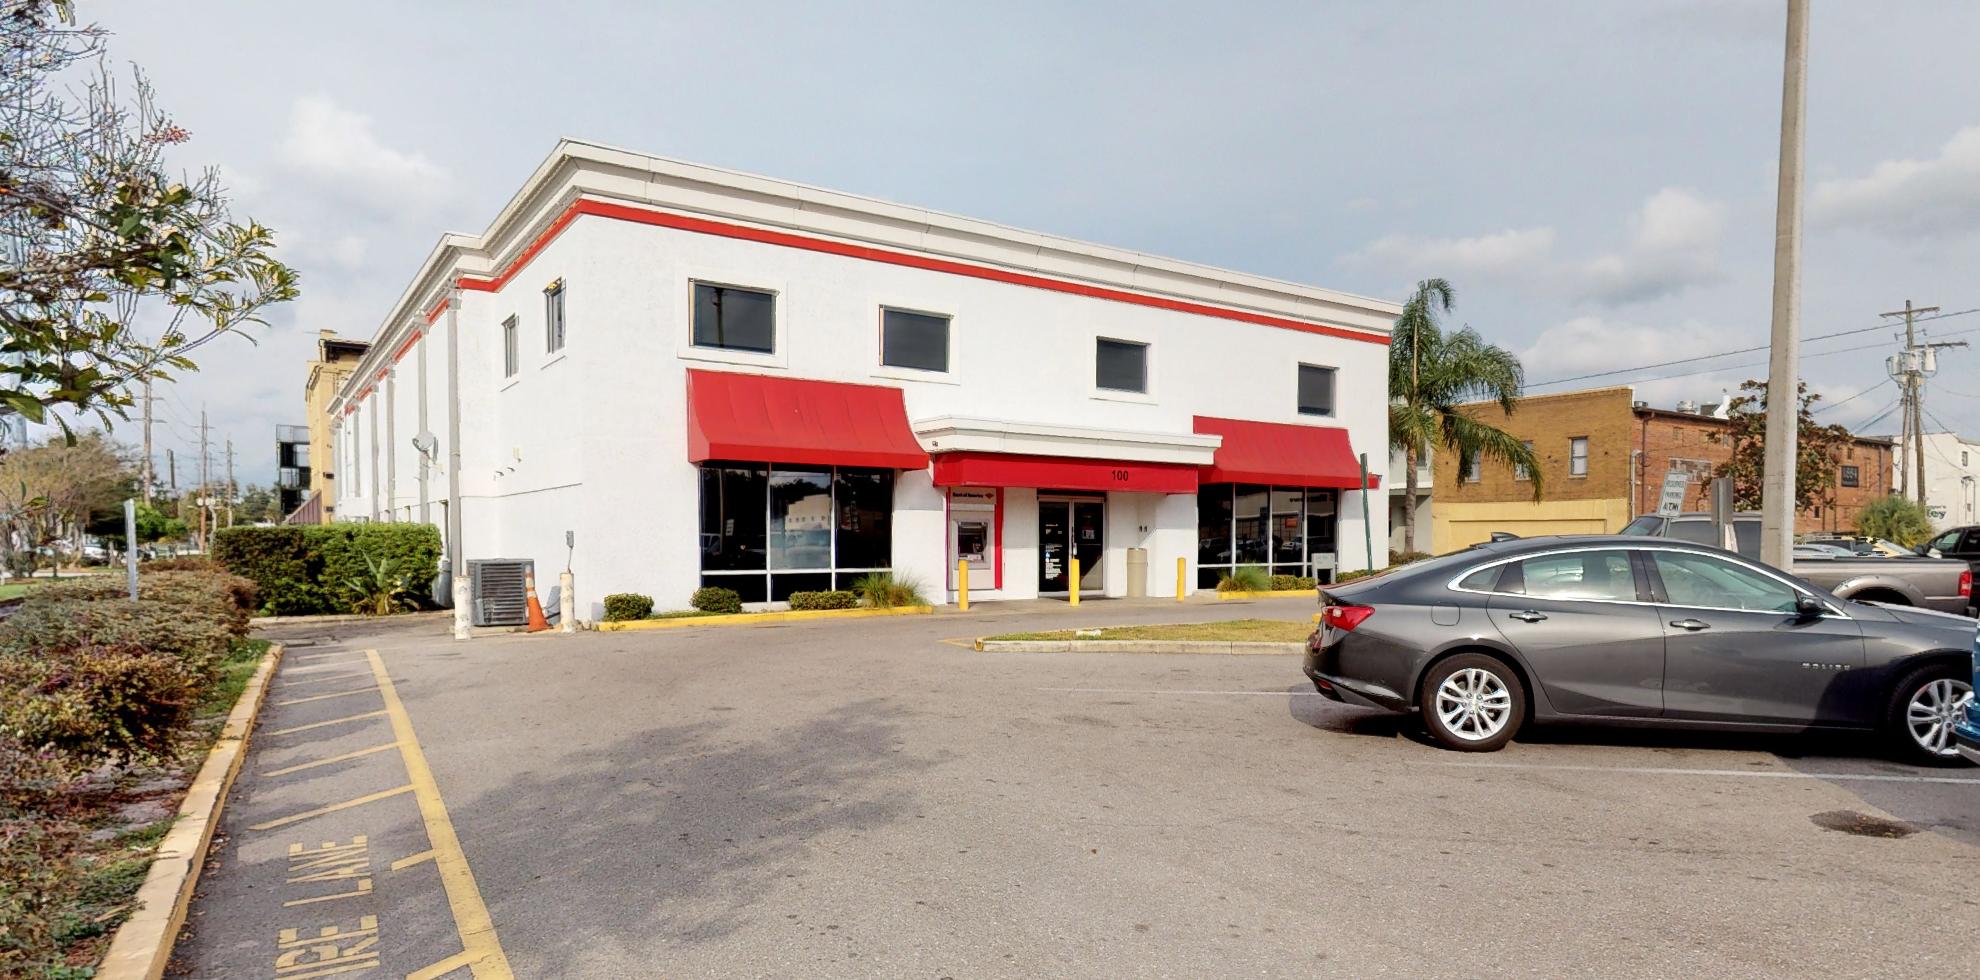 Bank of America financial center with walk-up ATM | 100 N Bay St, Eustis, FL 32726